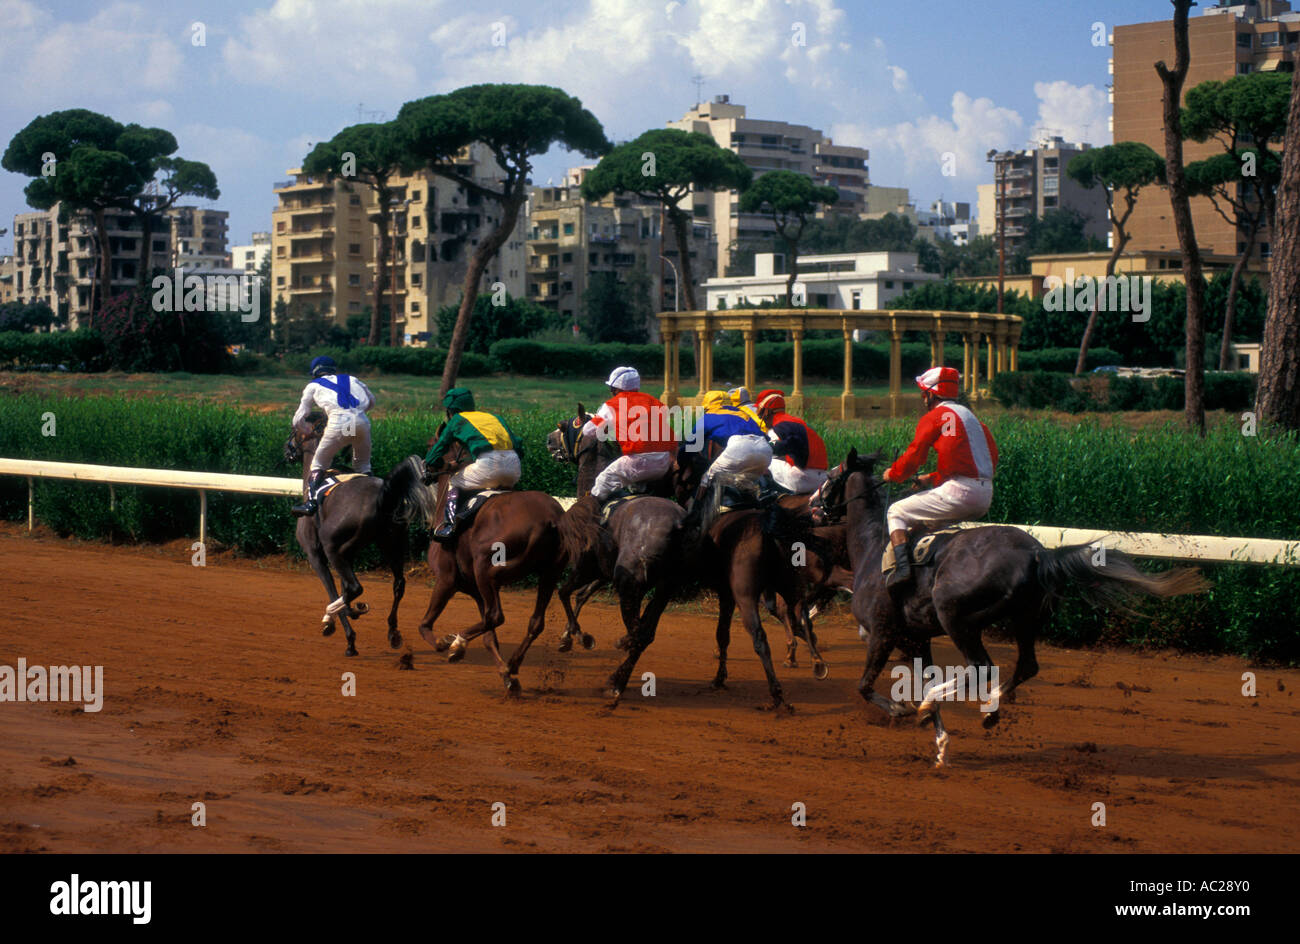 Horse Racing At The Hippodrome Near Former Green Line Beirut Lebanon